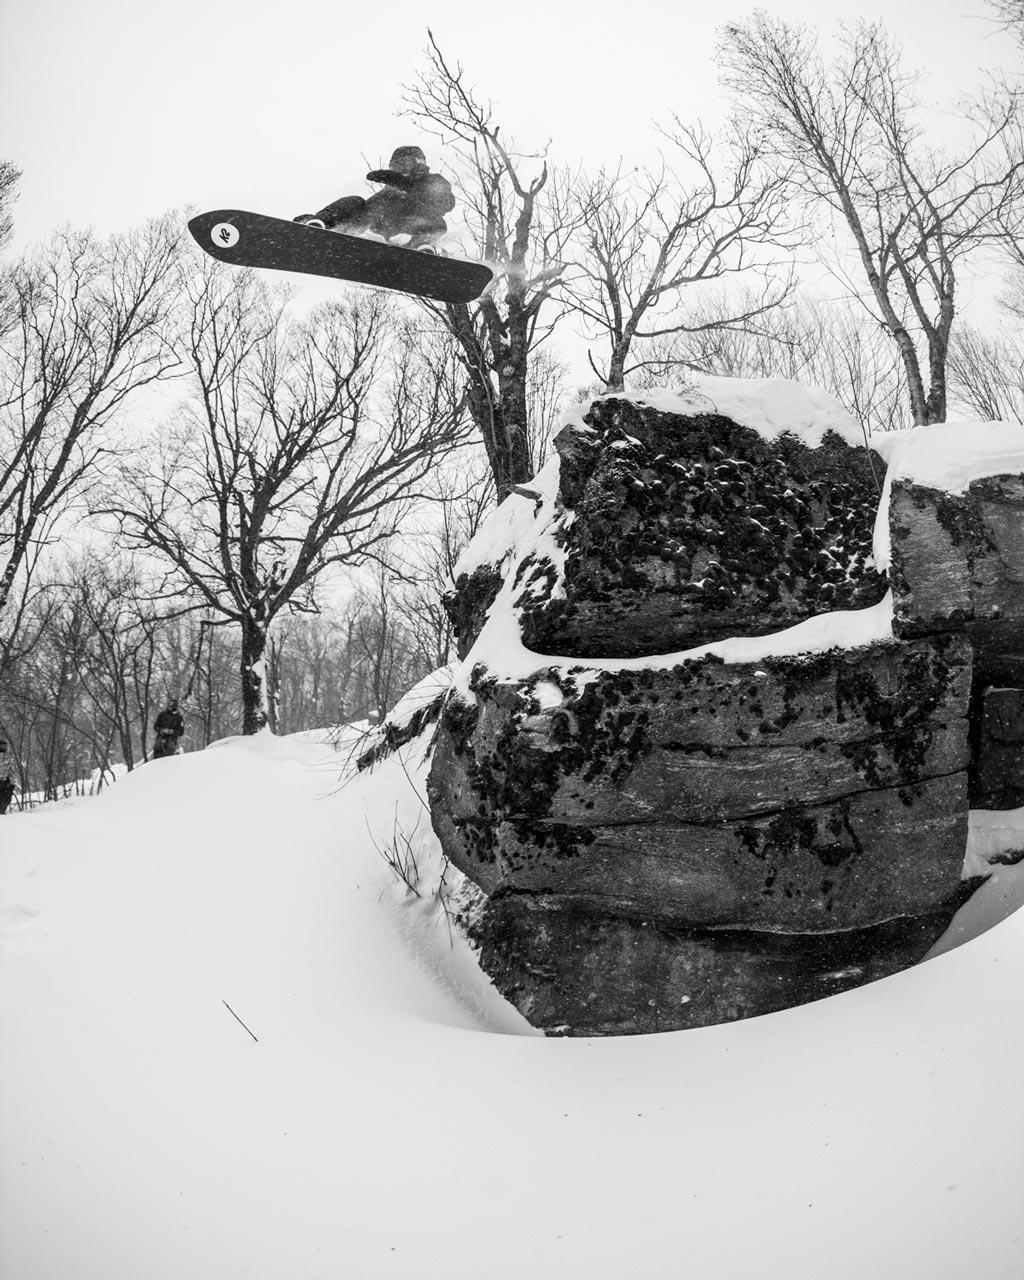 Nick Erickson |K2 Snowboarding